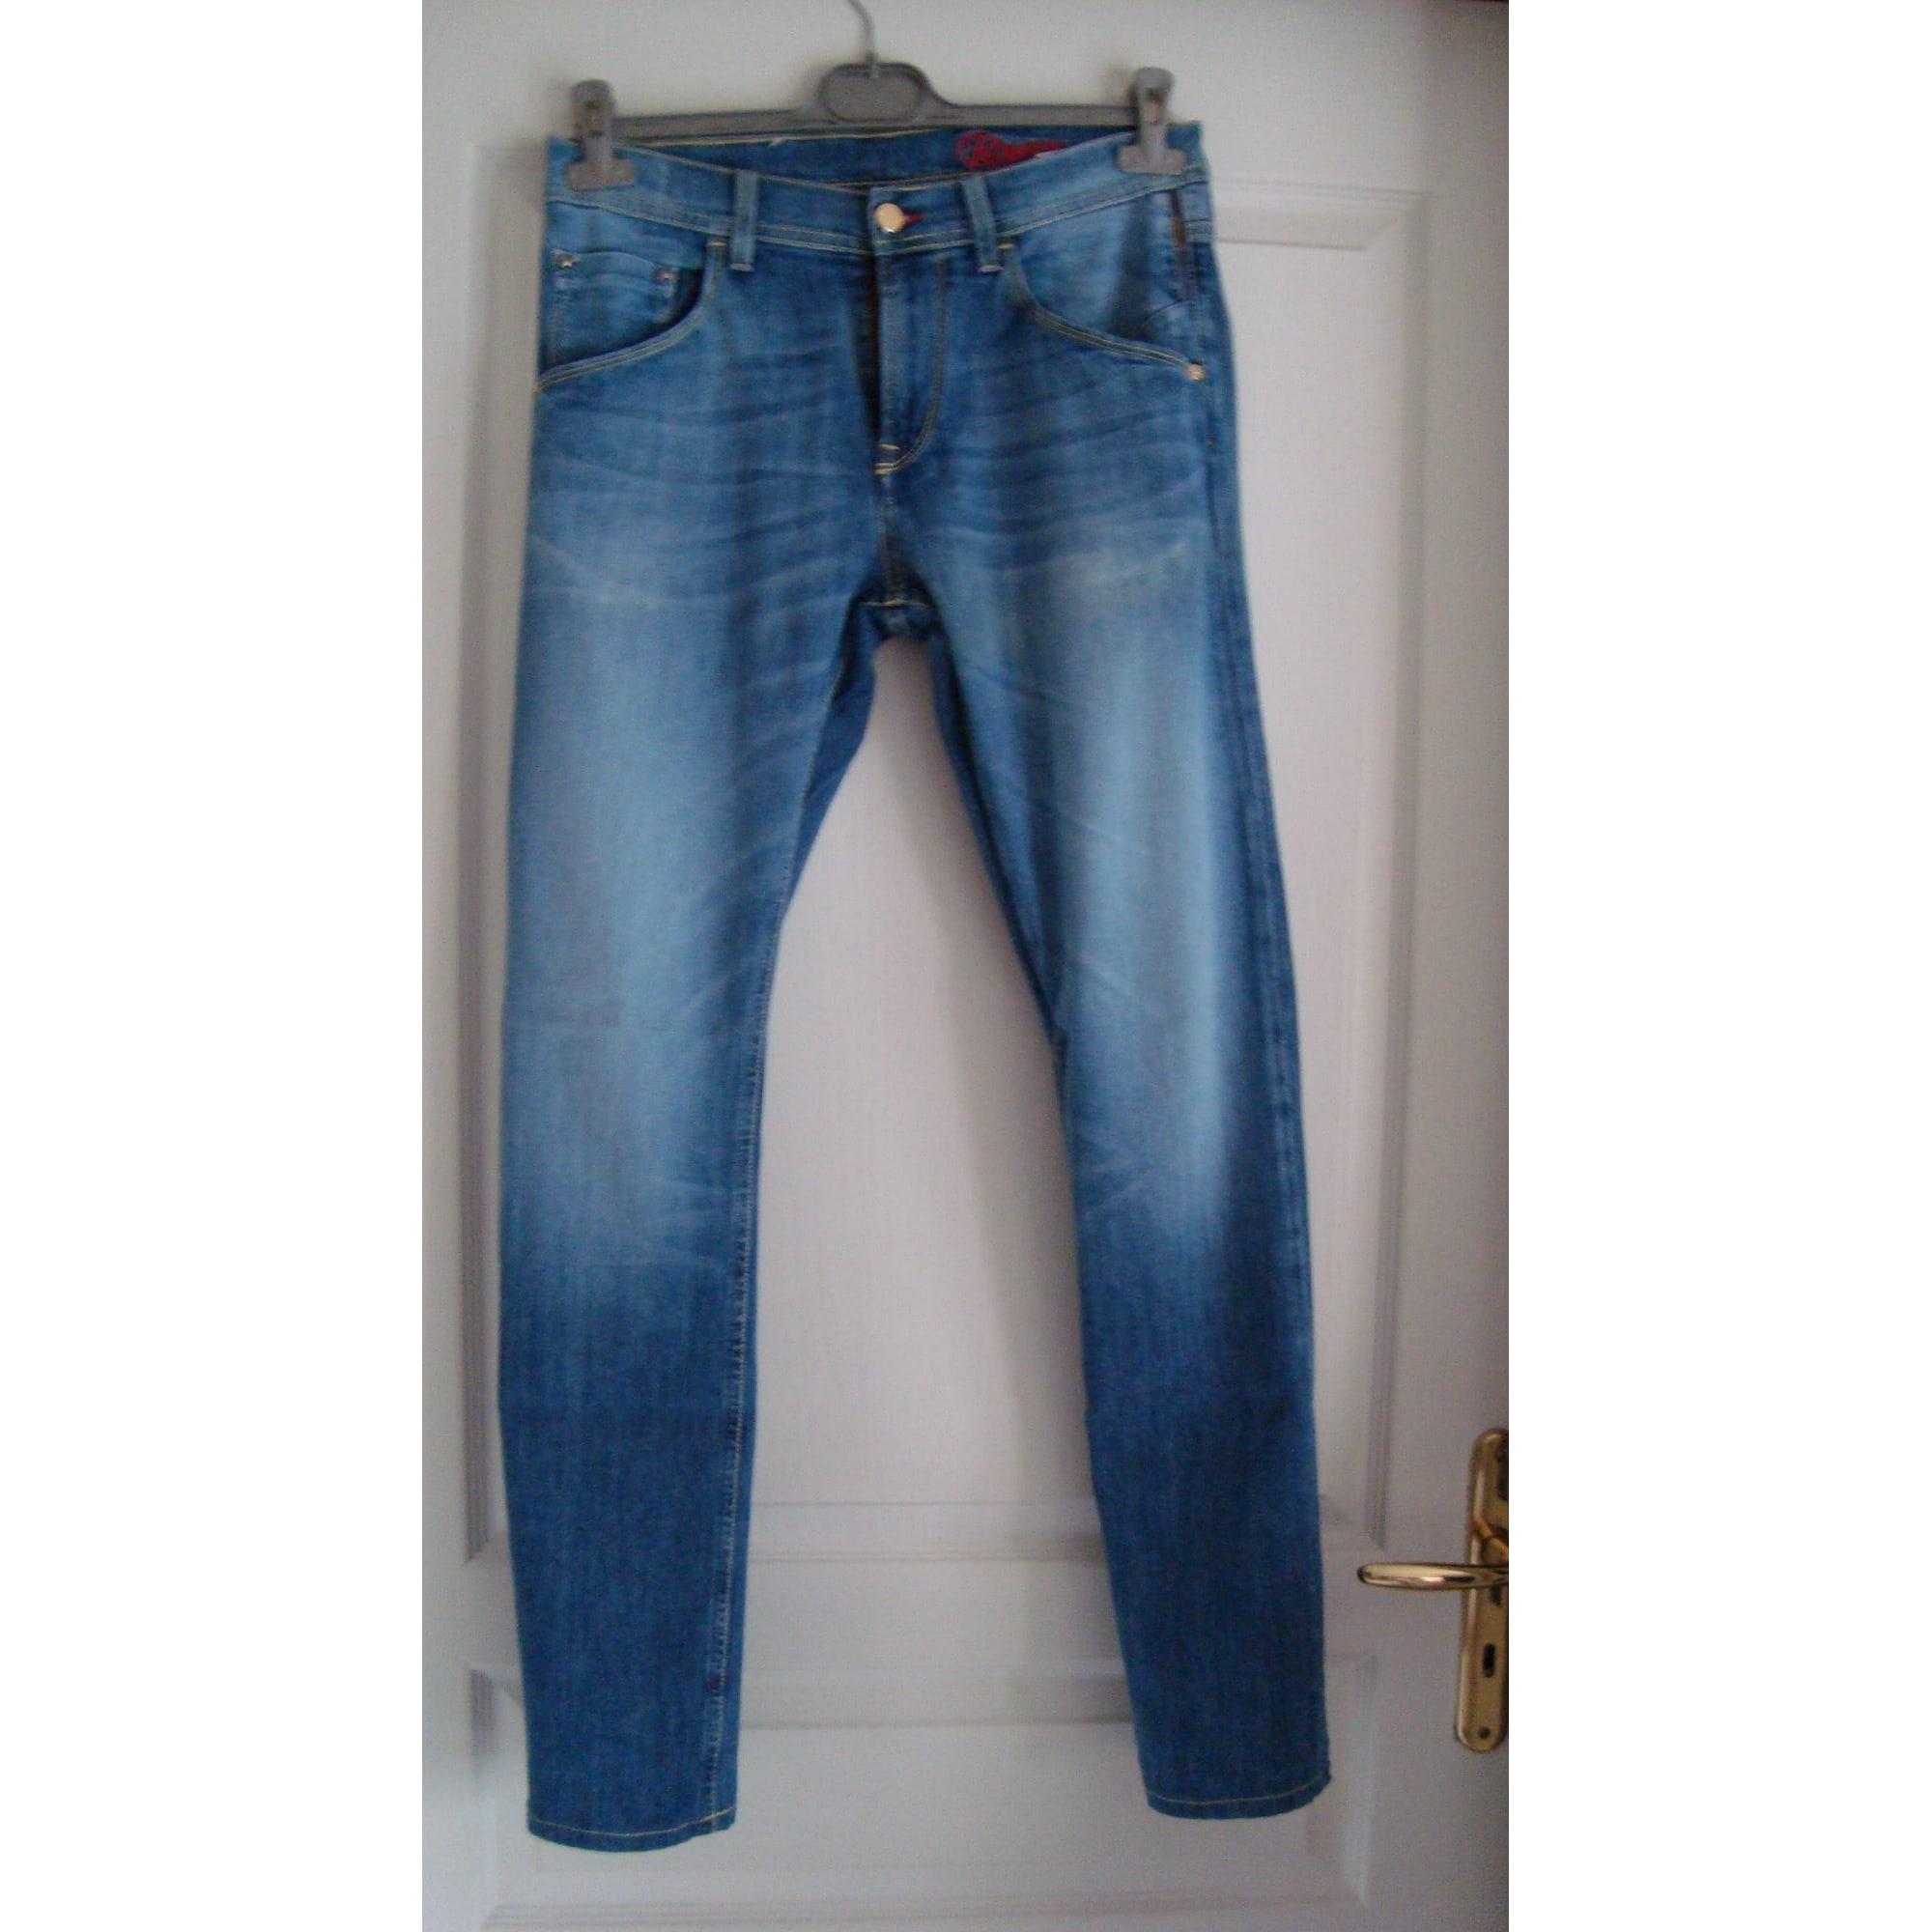 Jeans large, boyfriend MELTIN' POT Bleu, bleu marine, bleu turquoise